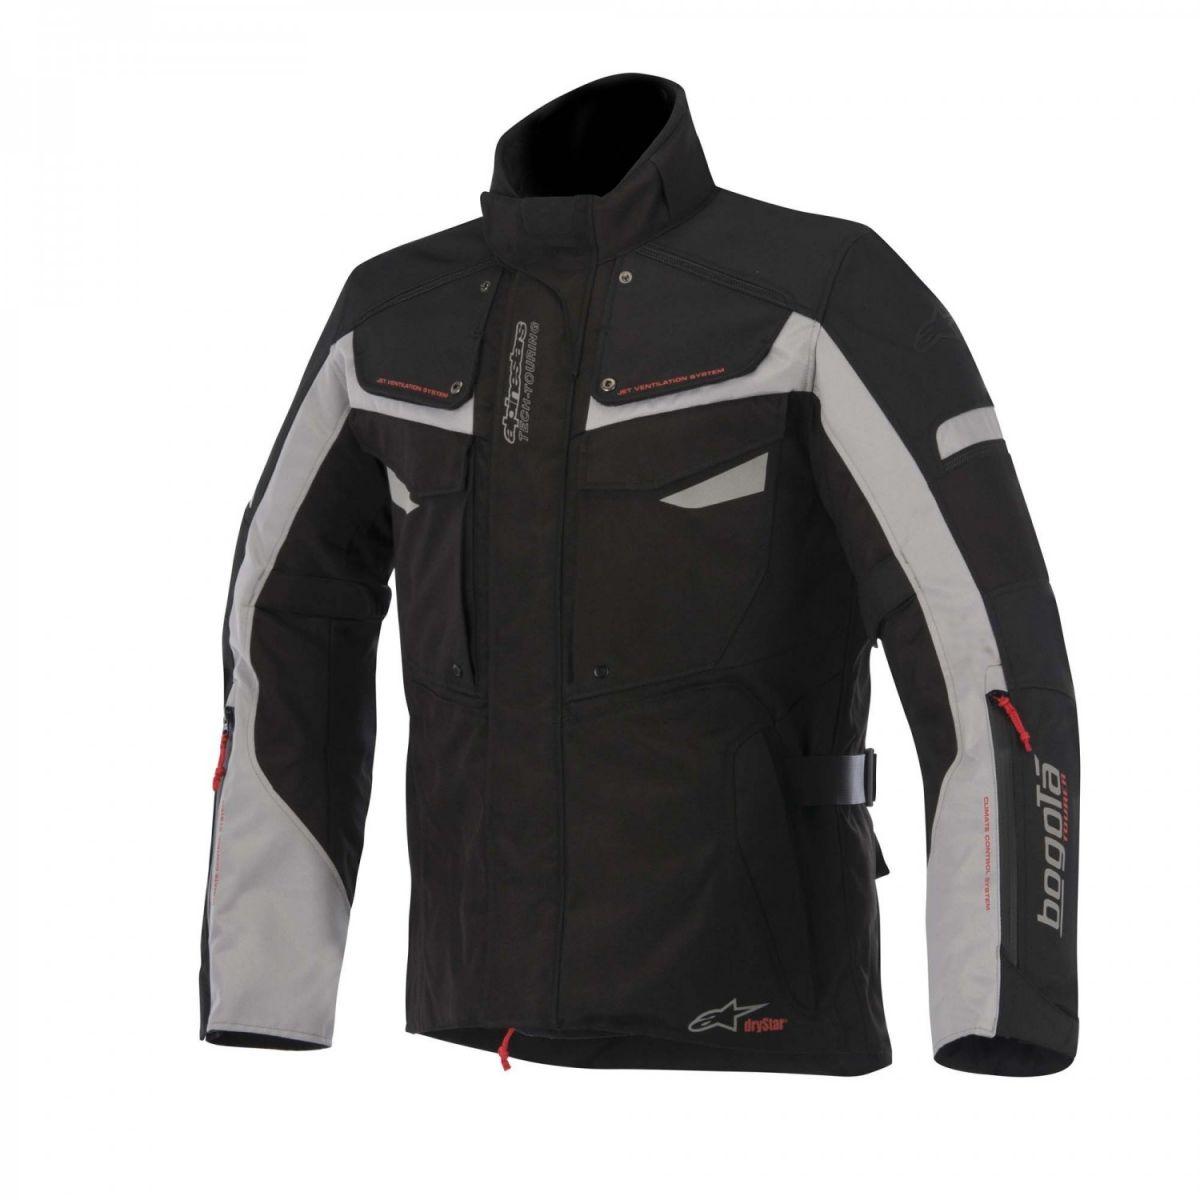 Jaqueta Alpinestars Bogotá  Dark Gray Parka  - Nova Suzuki Motos e Acessórios